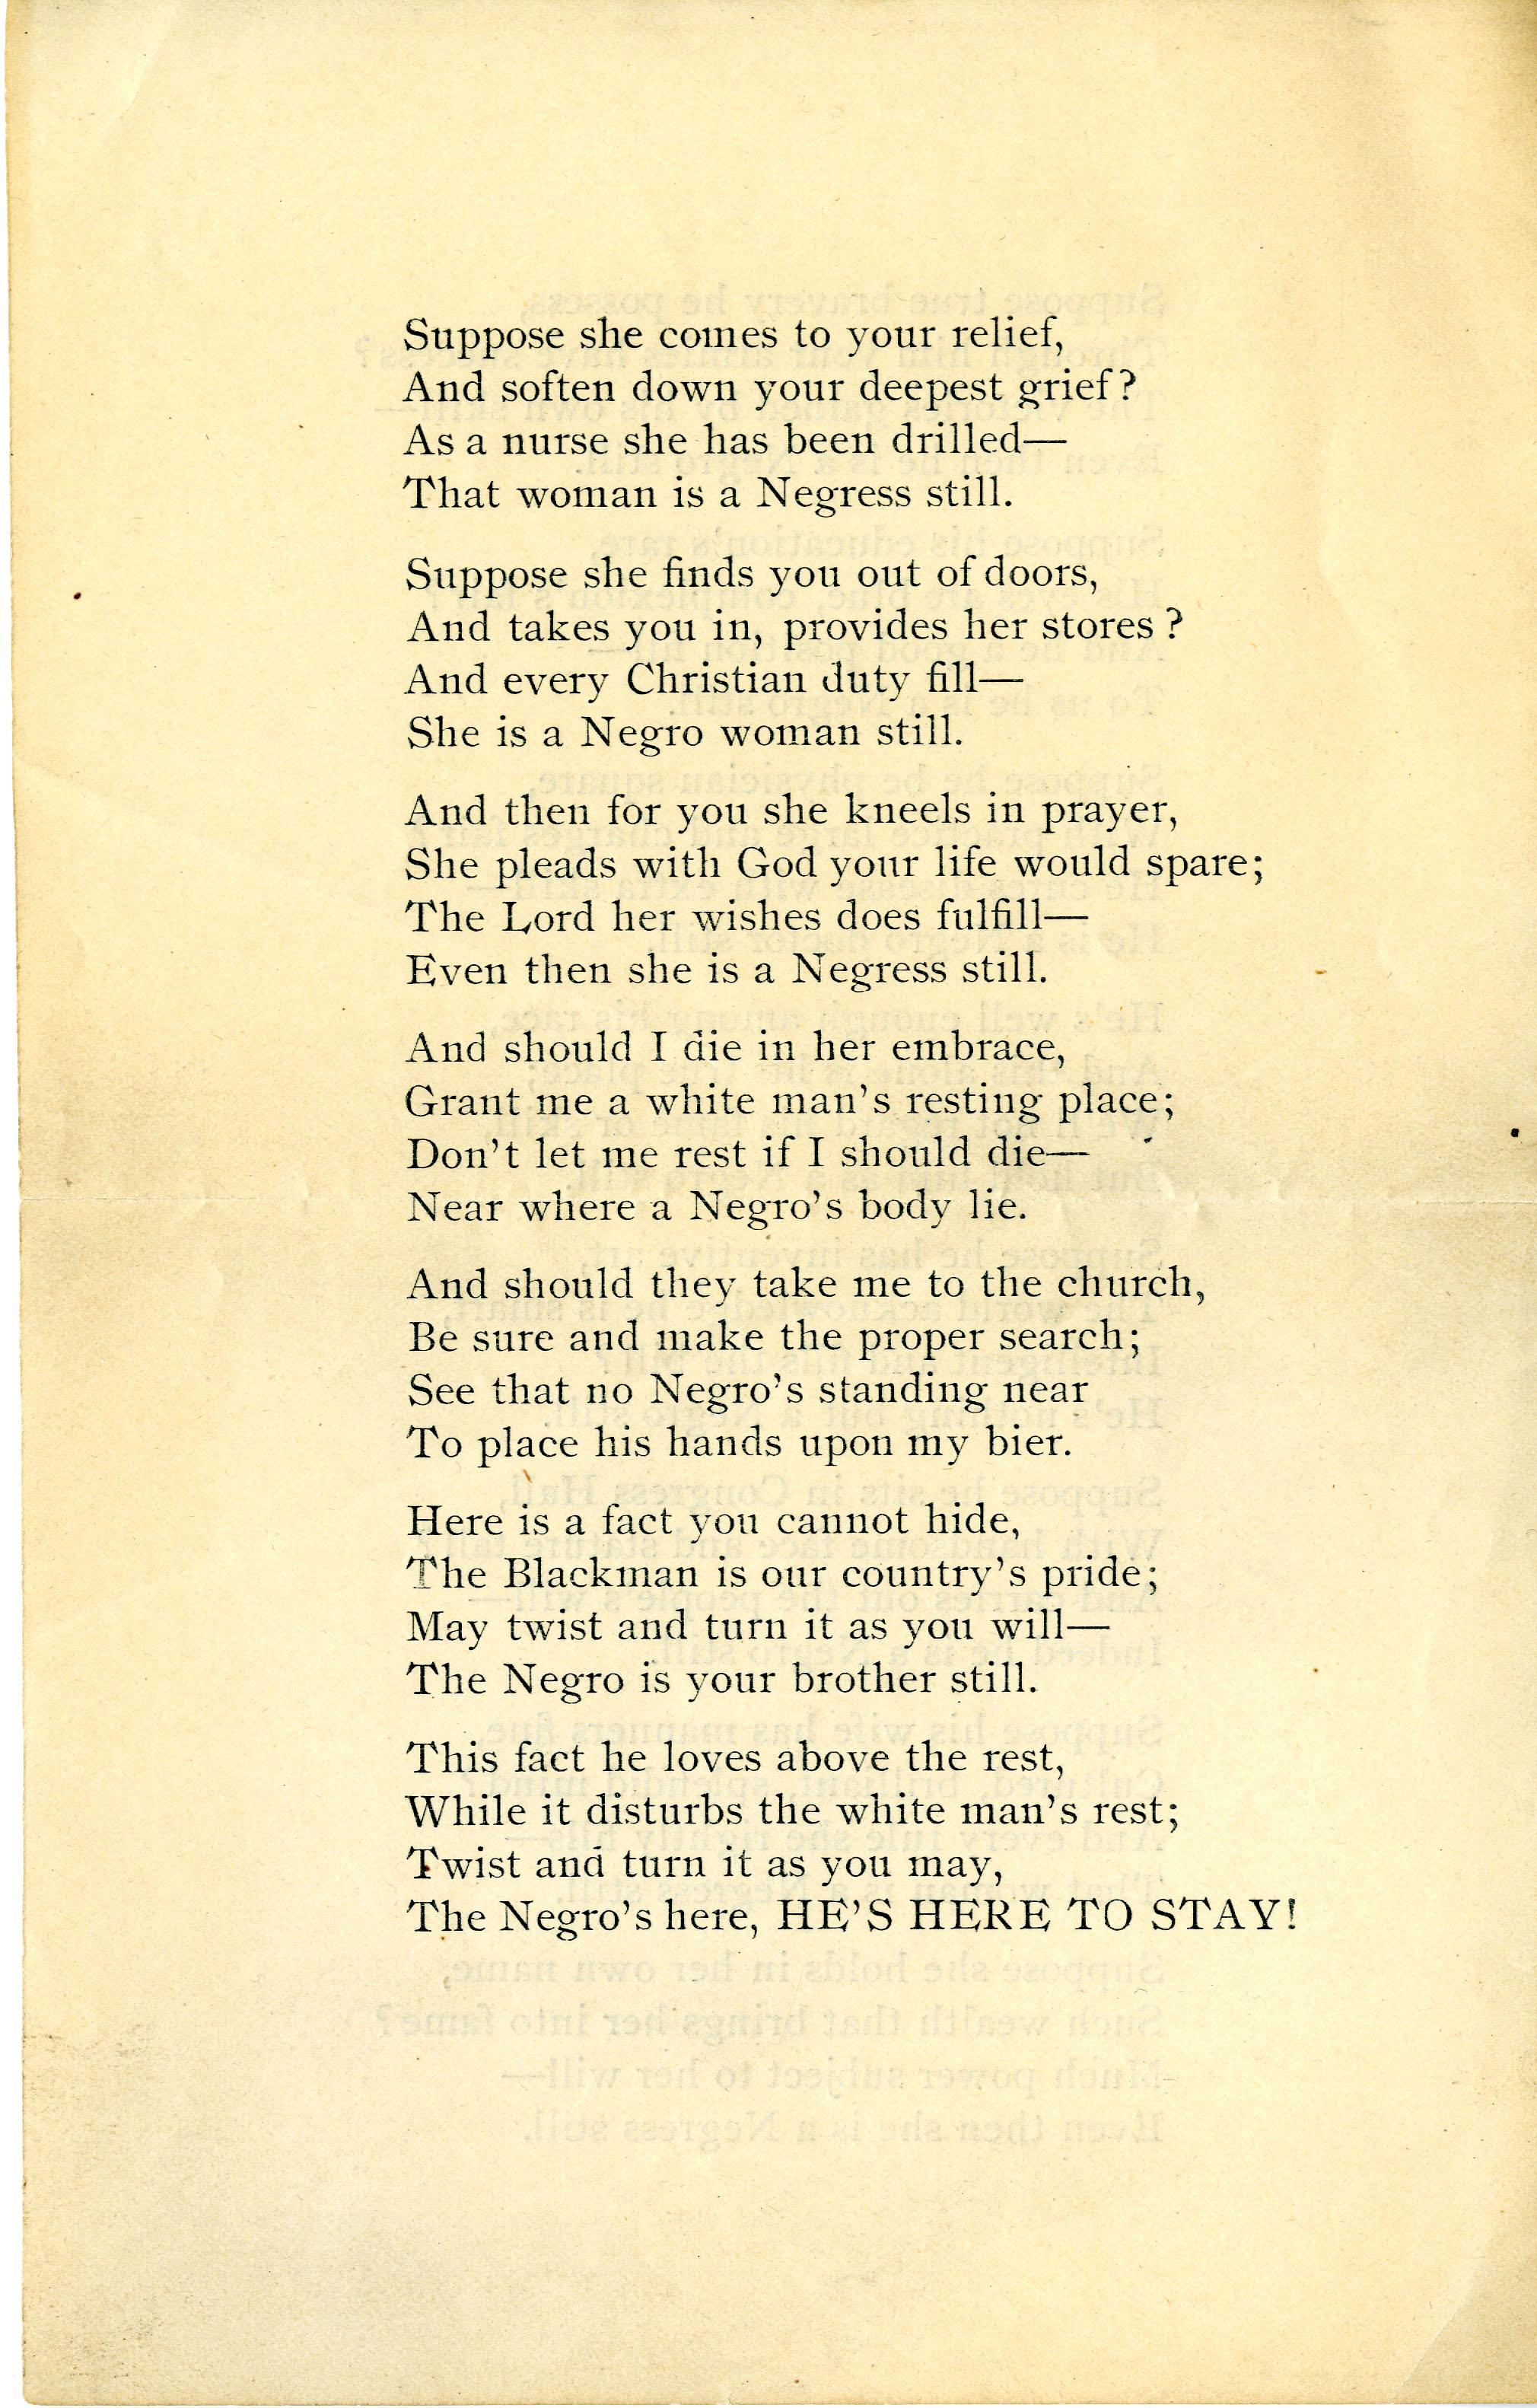 """He is a Negro Still"" by Solomon Brown, 1891."